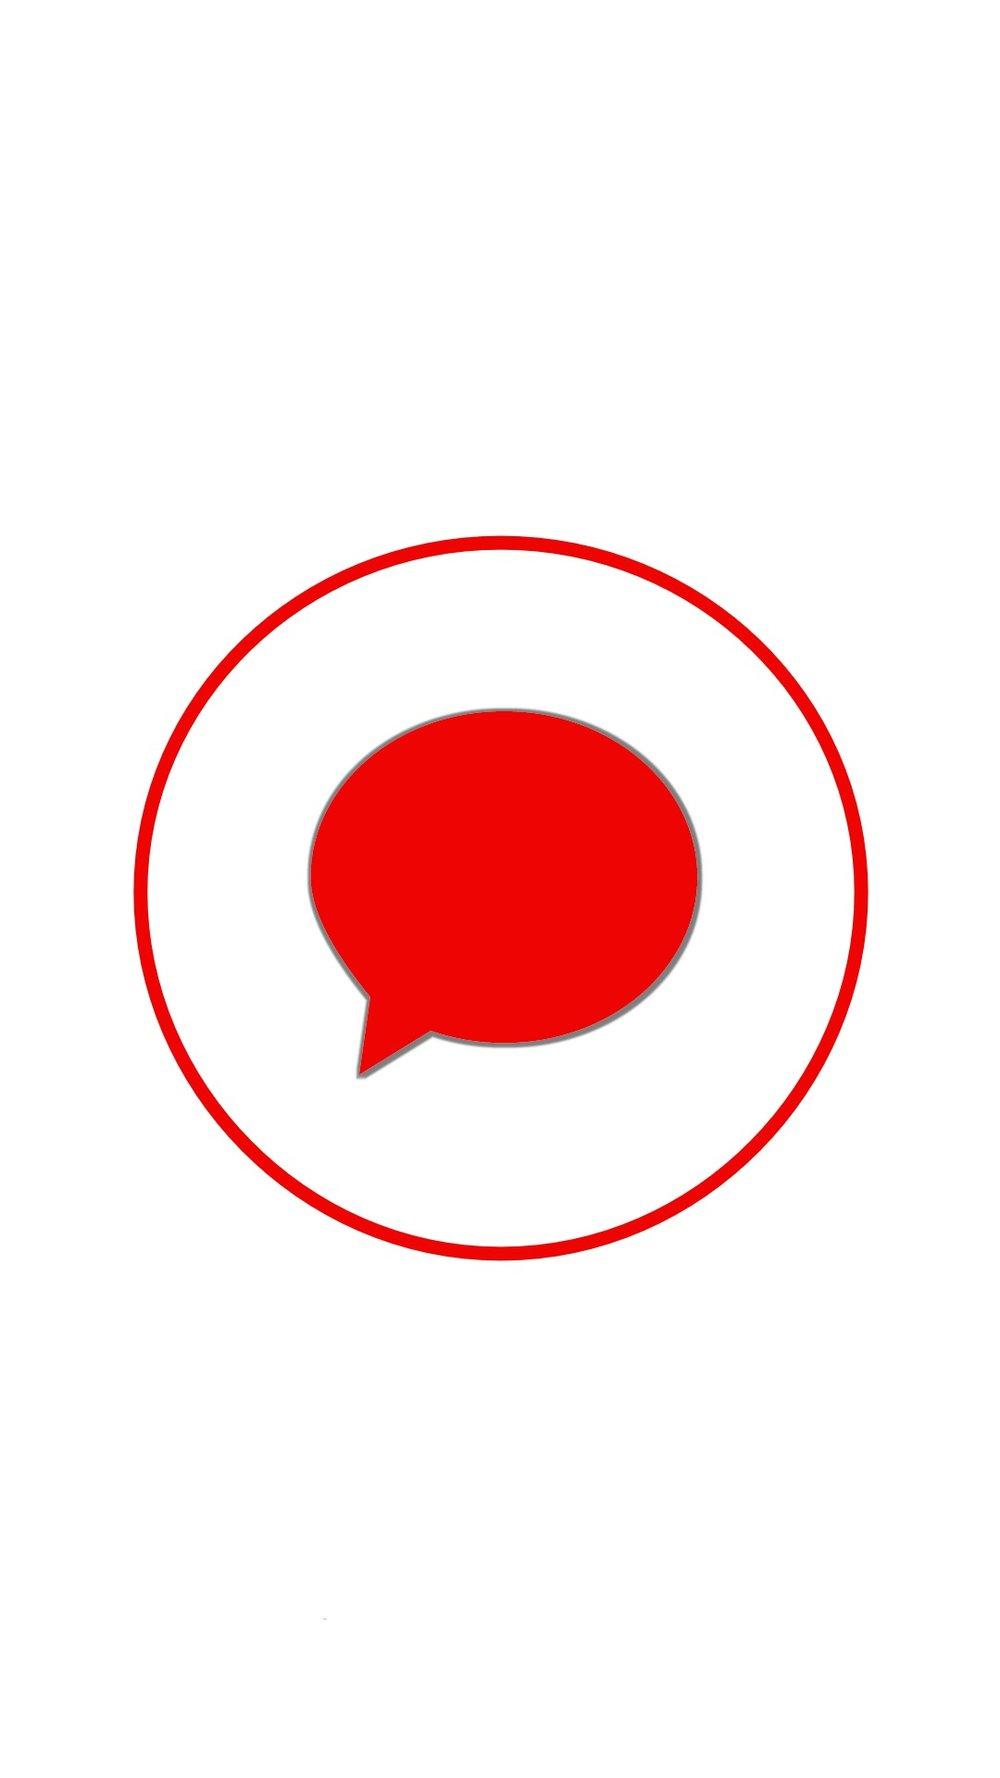 Instagram-cover-chat-red-white-lotnotes.com.jpg